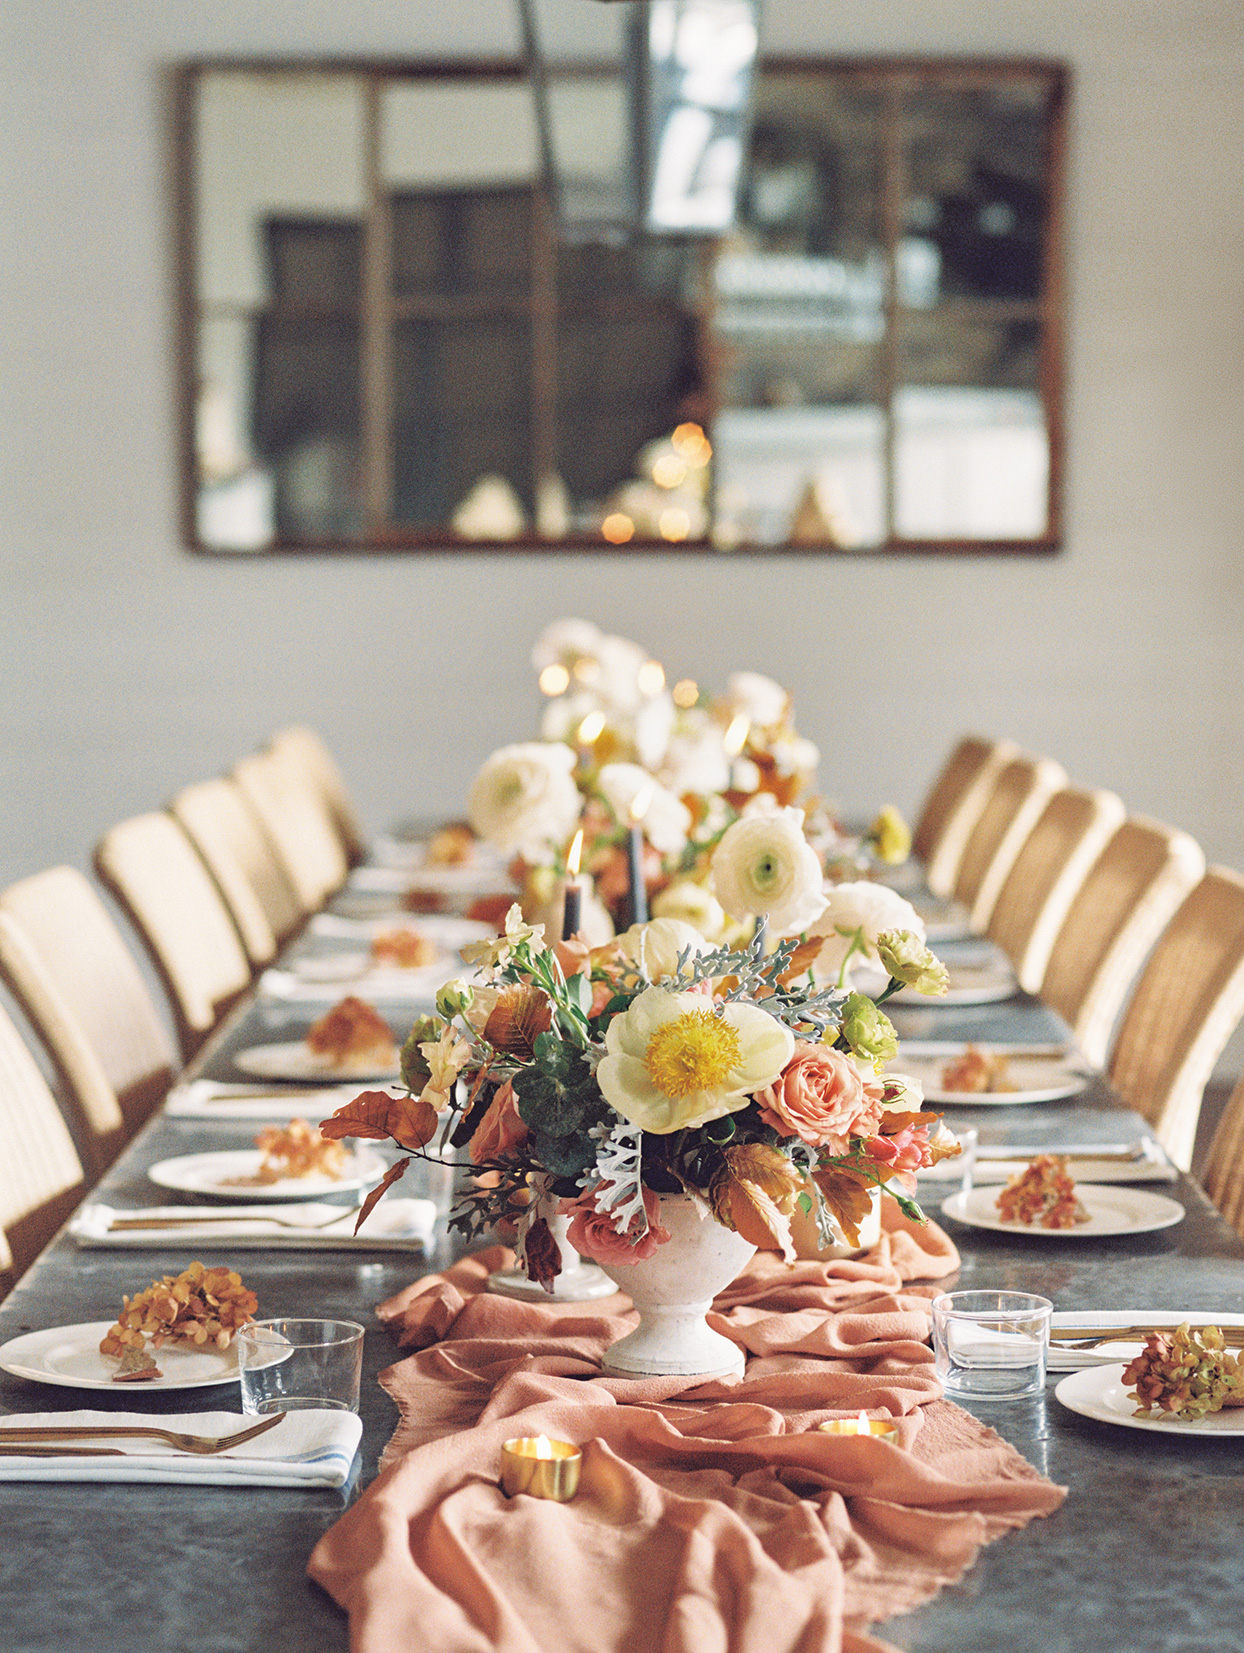 elizabeth scott wedding reception long table with orange and yellow decorations